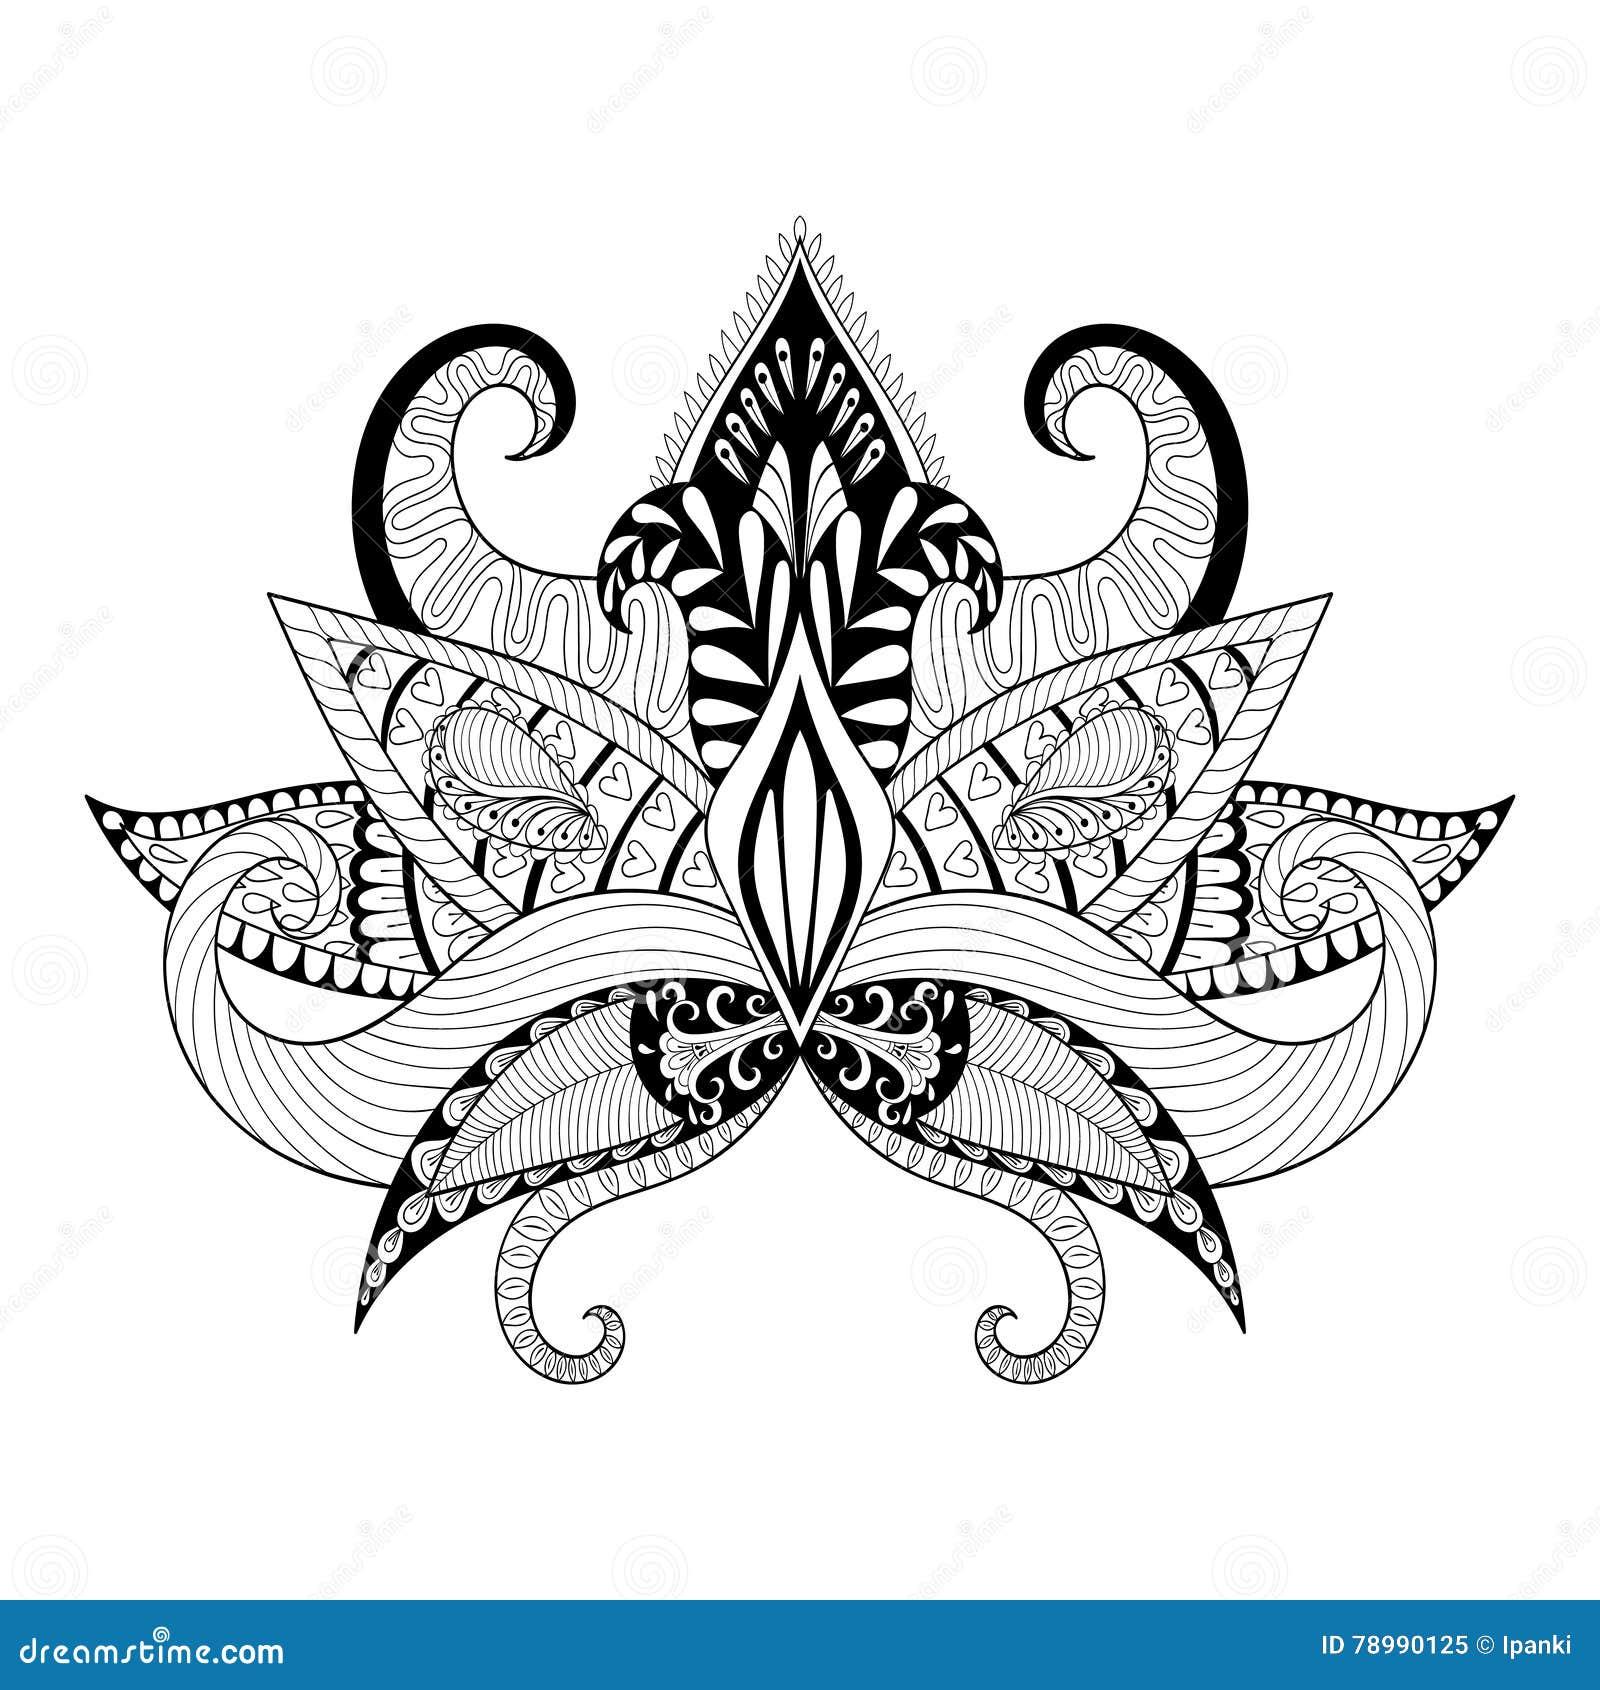 Boho ornamental lotus flower blackwork tattoo design stock vector download boho ornamental lotus flower blackwork tattoo design stock vector illustration of drawing mightylinksfo